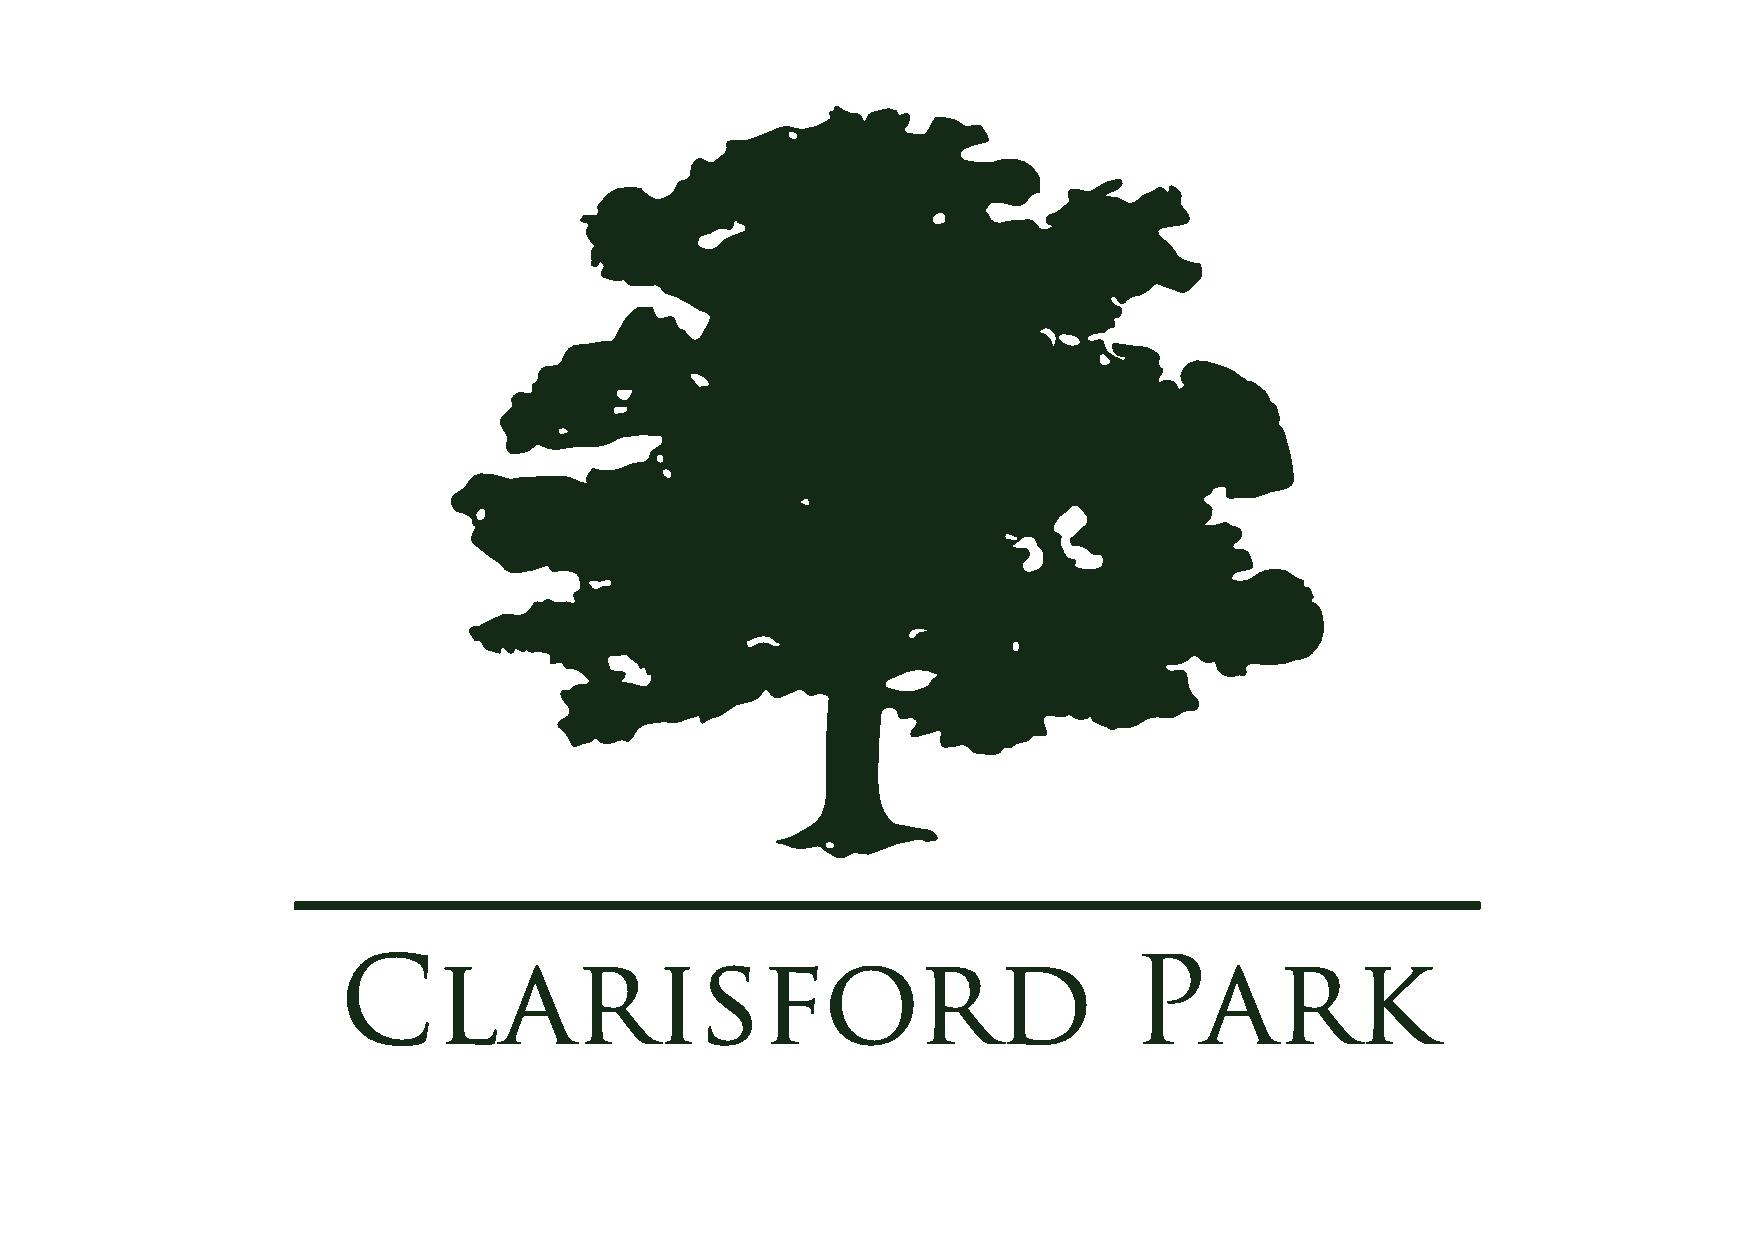 Clarisford_Park-logo